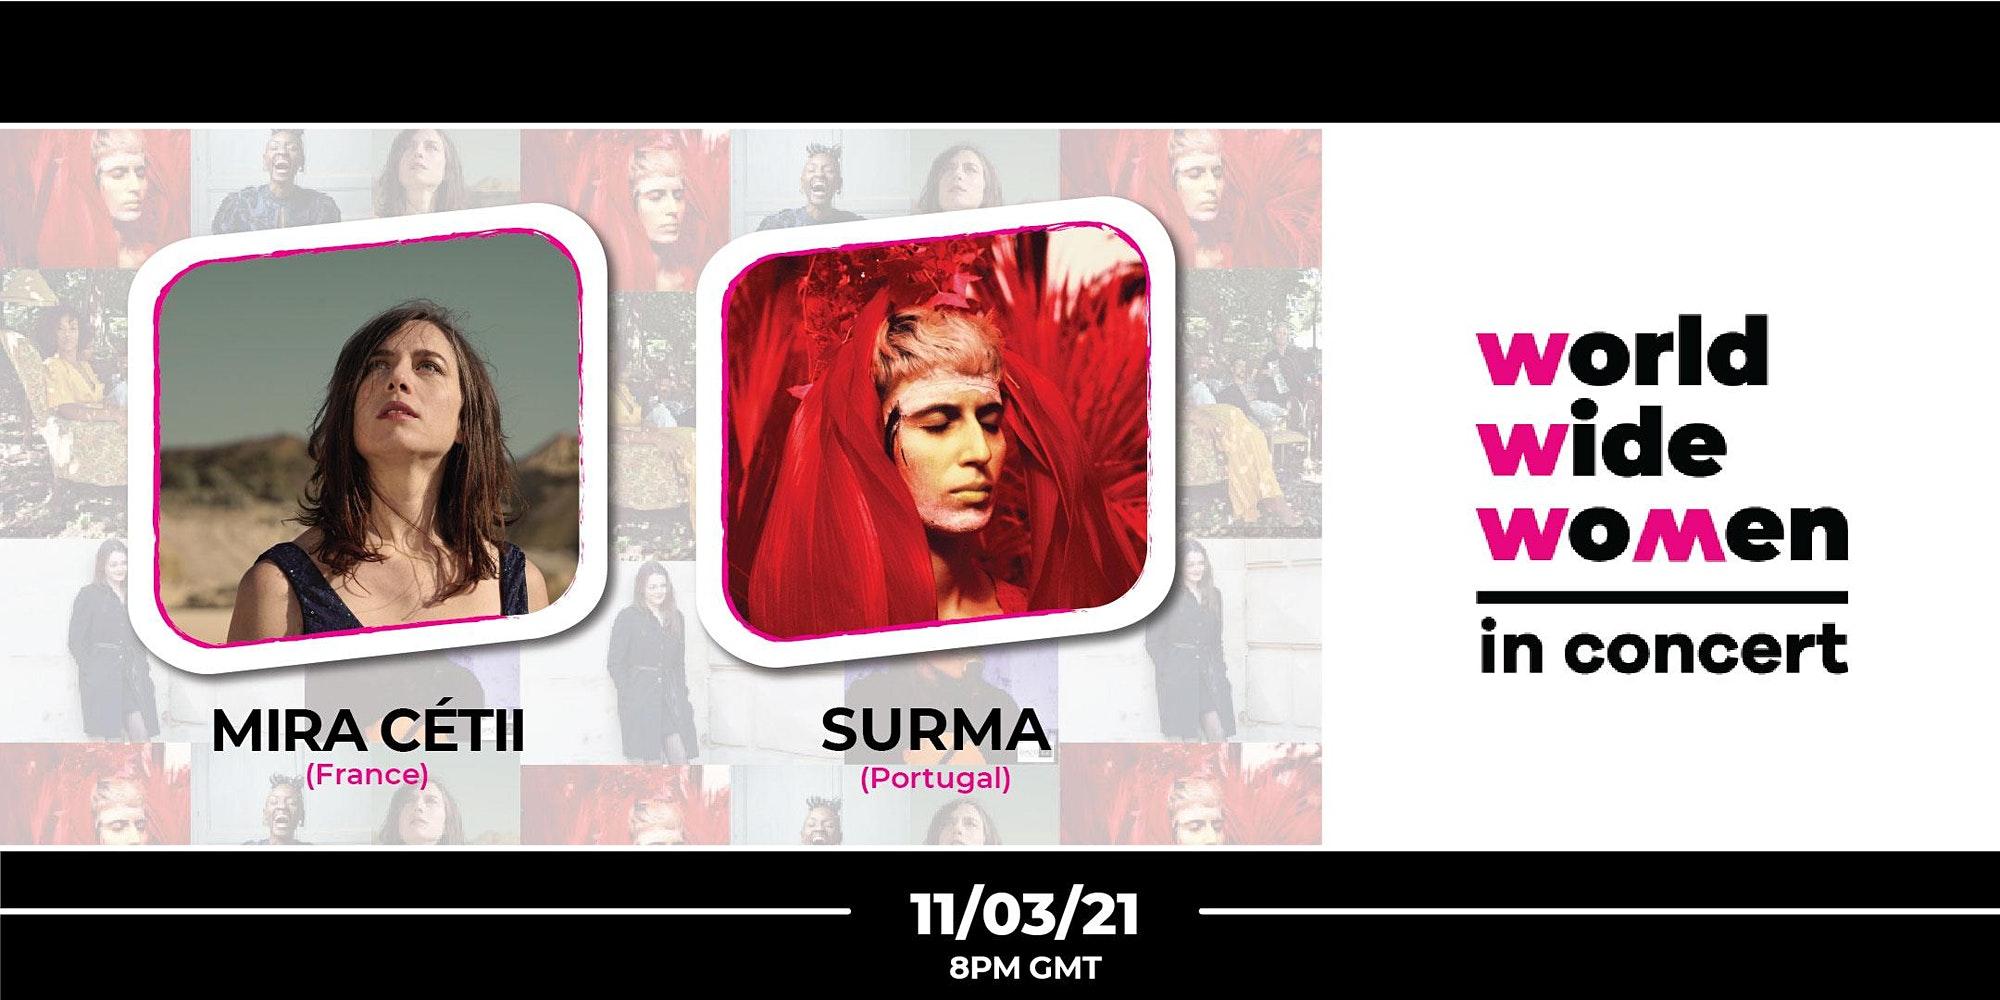 Mira Cétii & Surma - Worldwide Wo+men in Concert #8